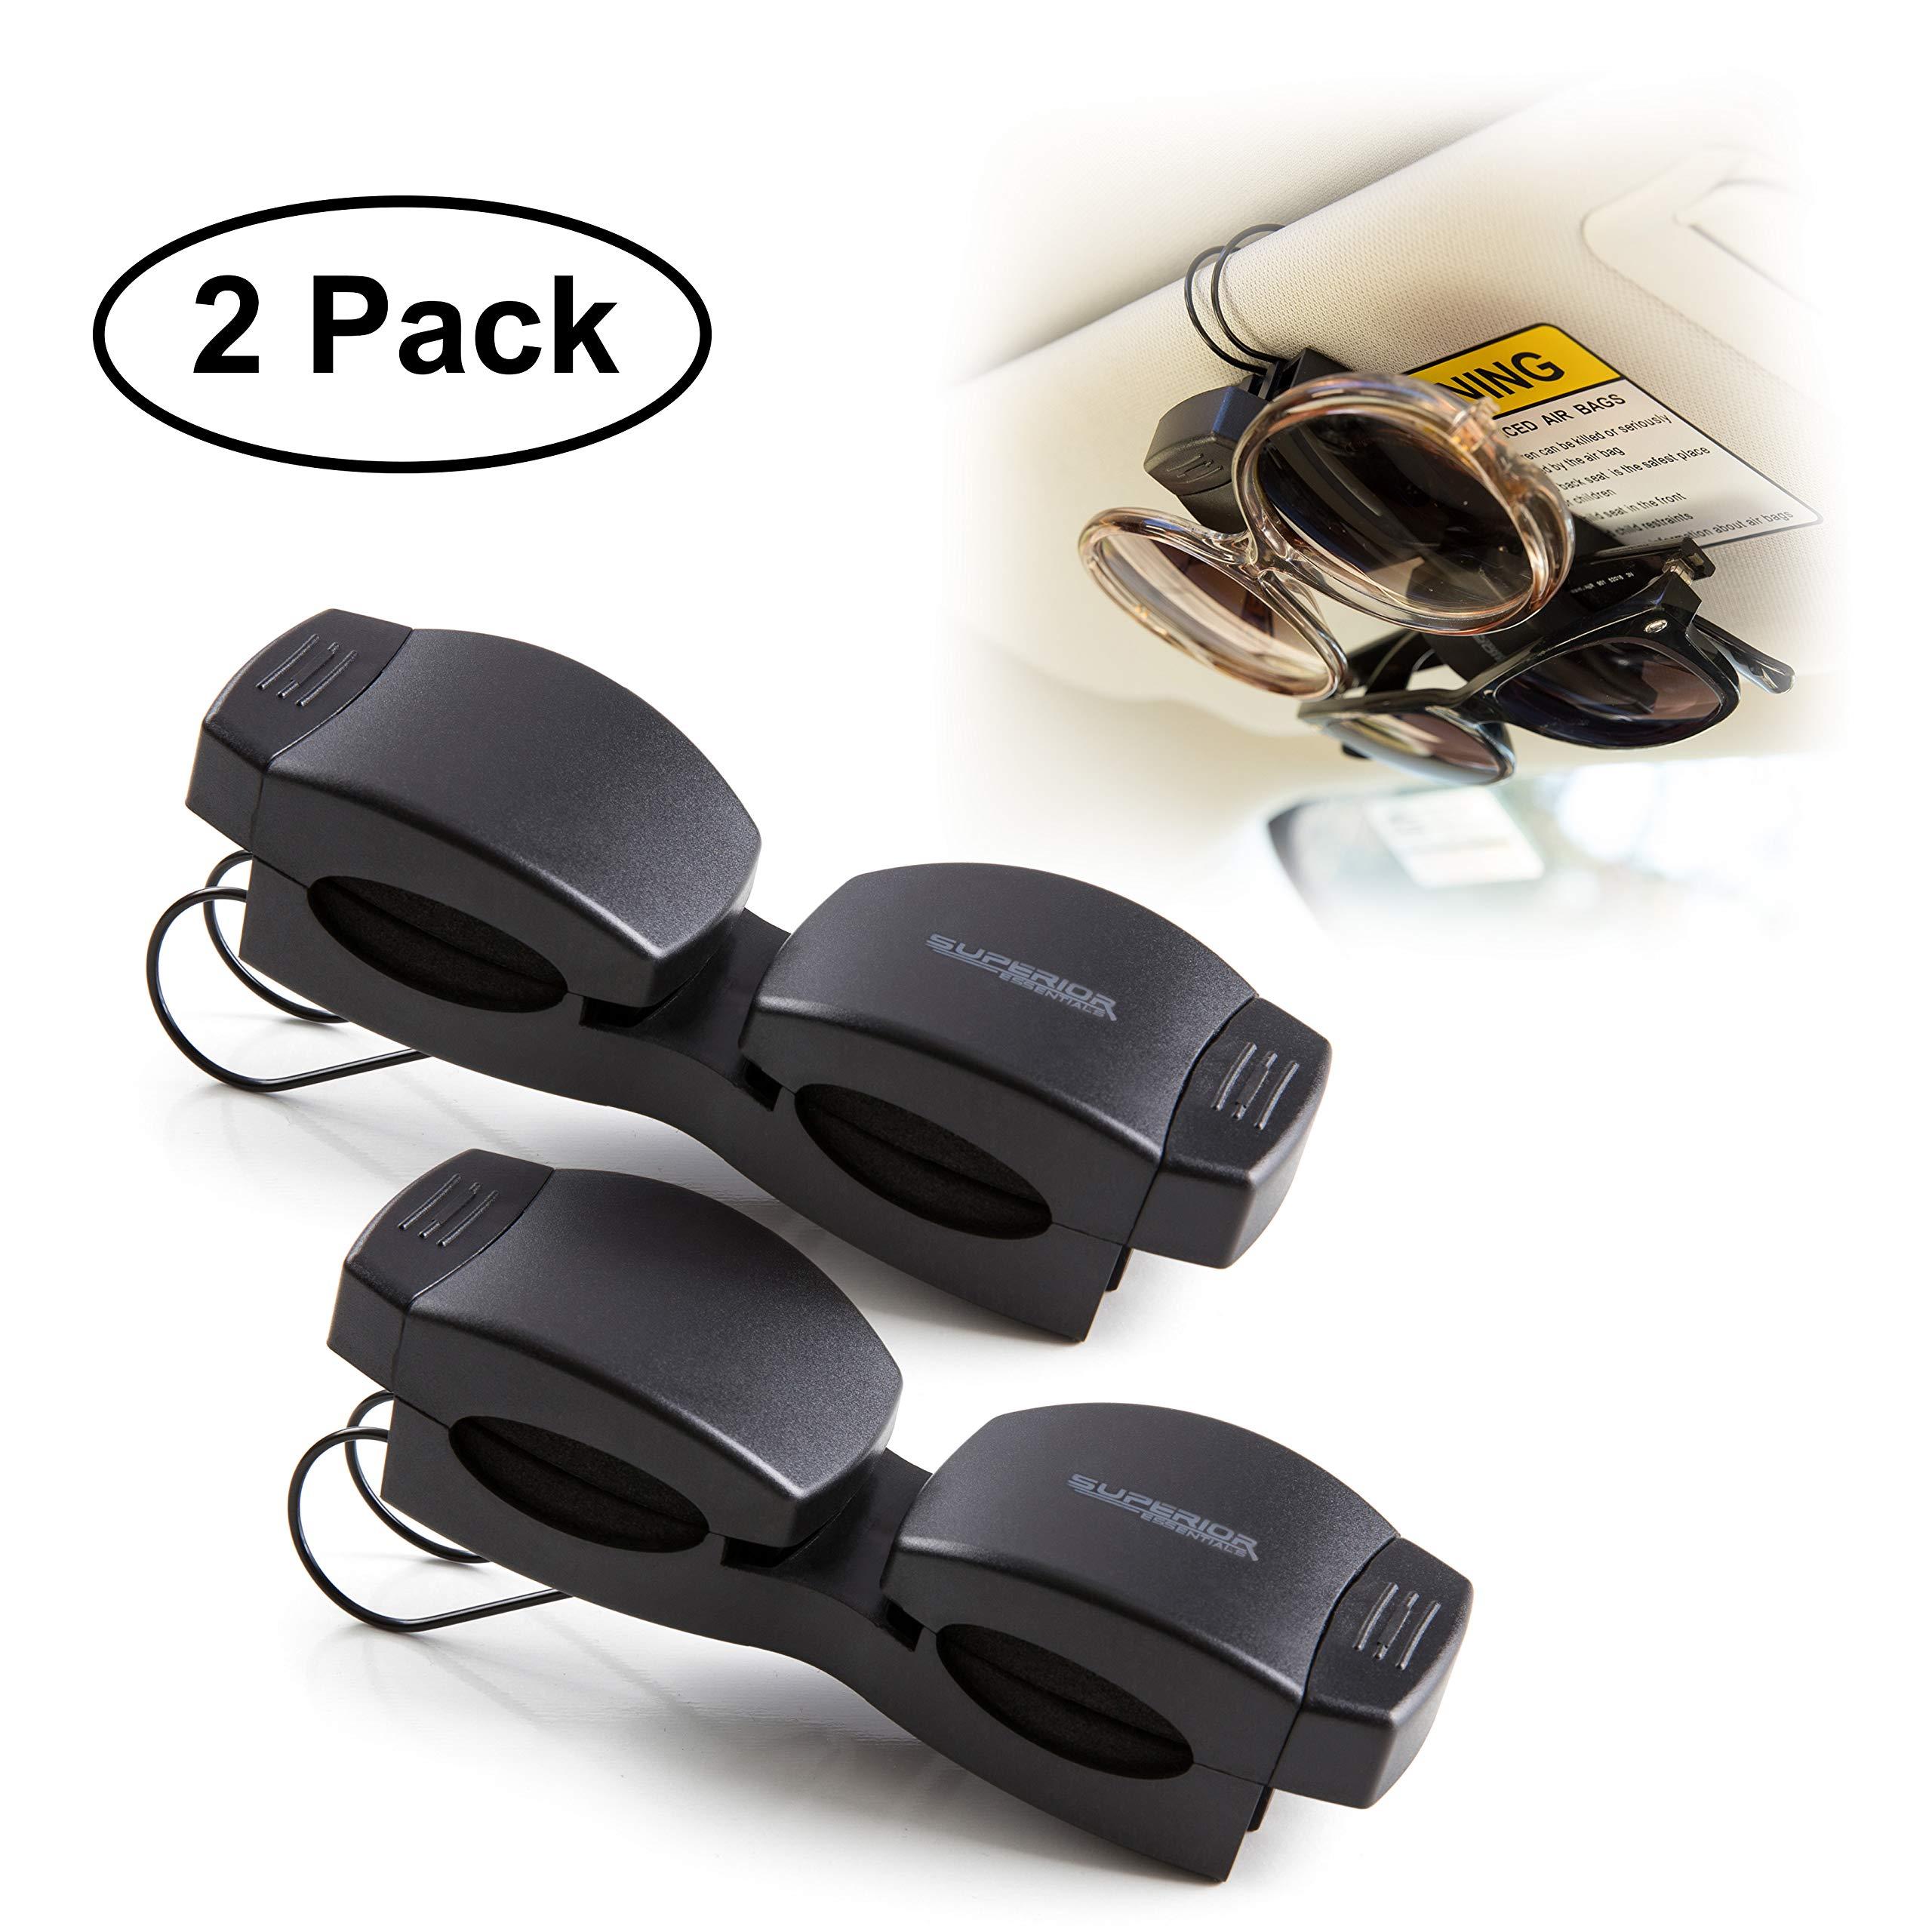 Superior Essentials Locking Double Sunglasses Holder for Sun Visor-Securely Holds Glasses & Sunglasses on Sun-Visor-Set of 2 by Superior Essentials